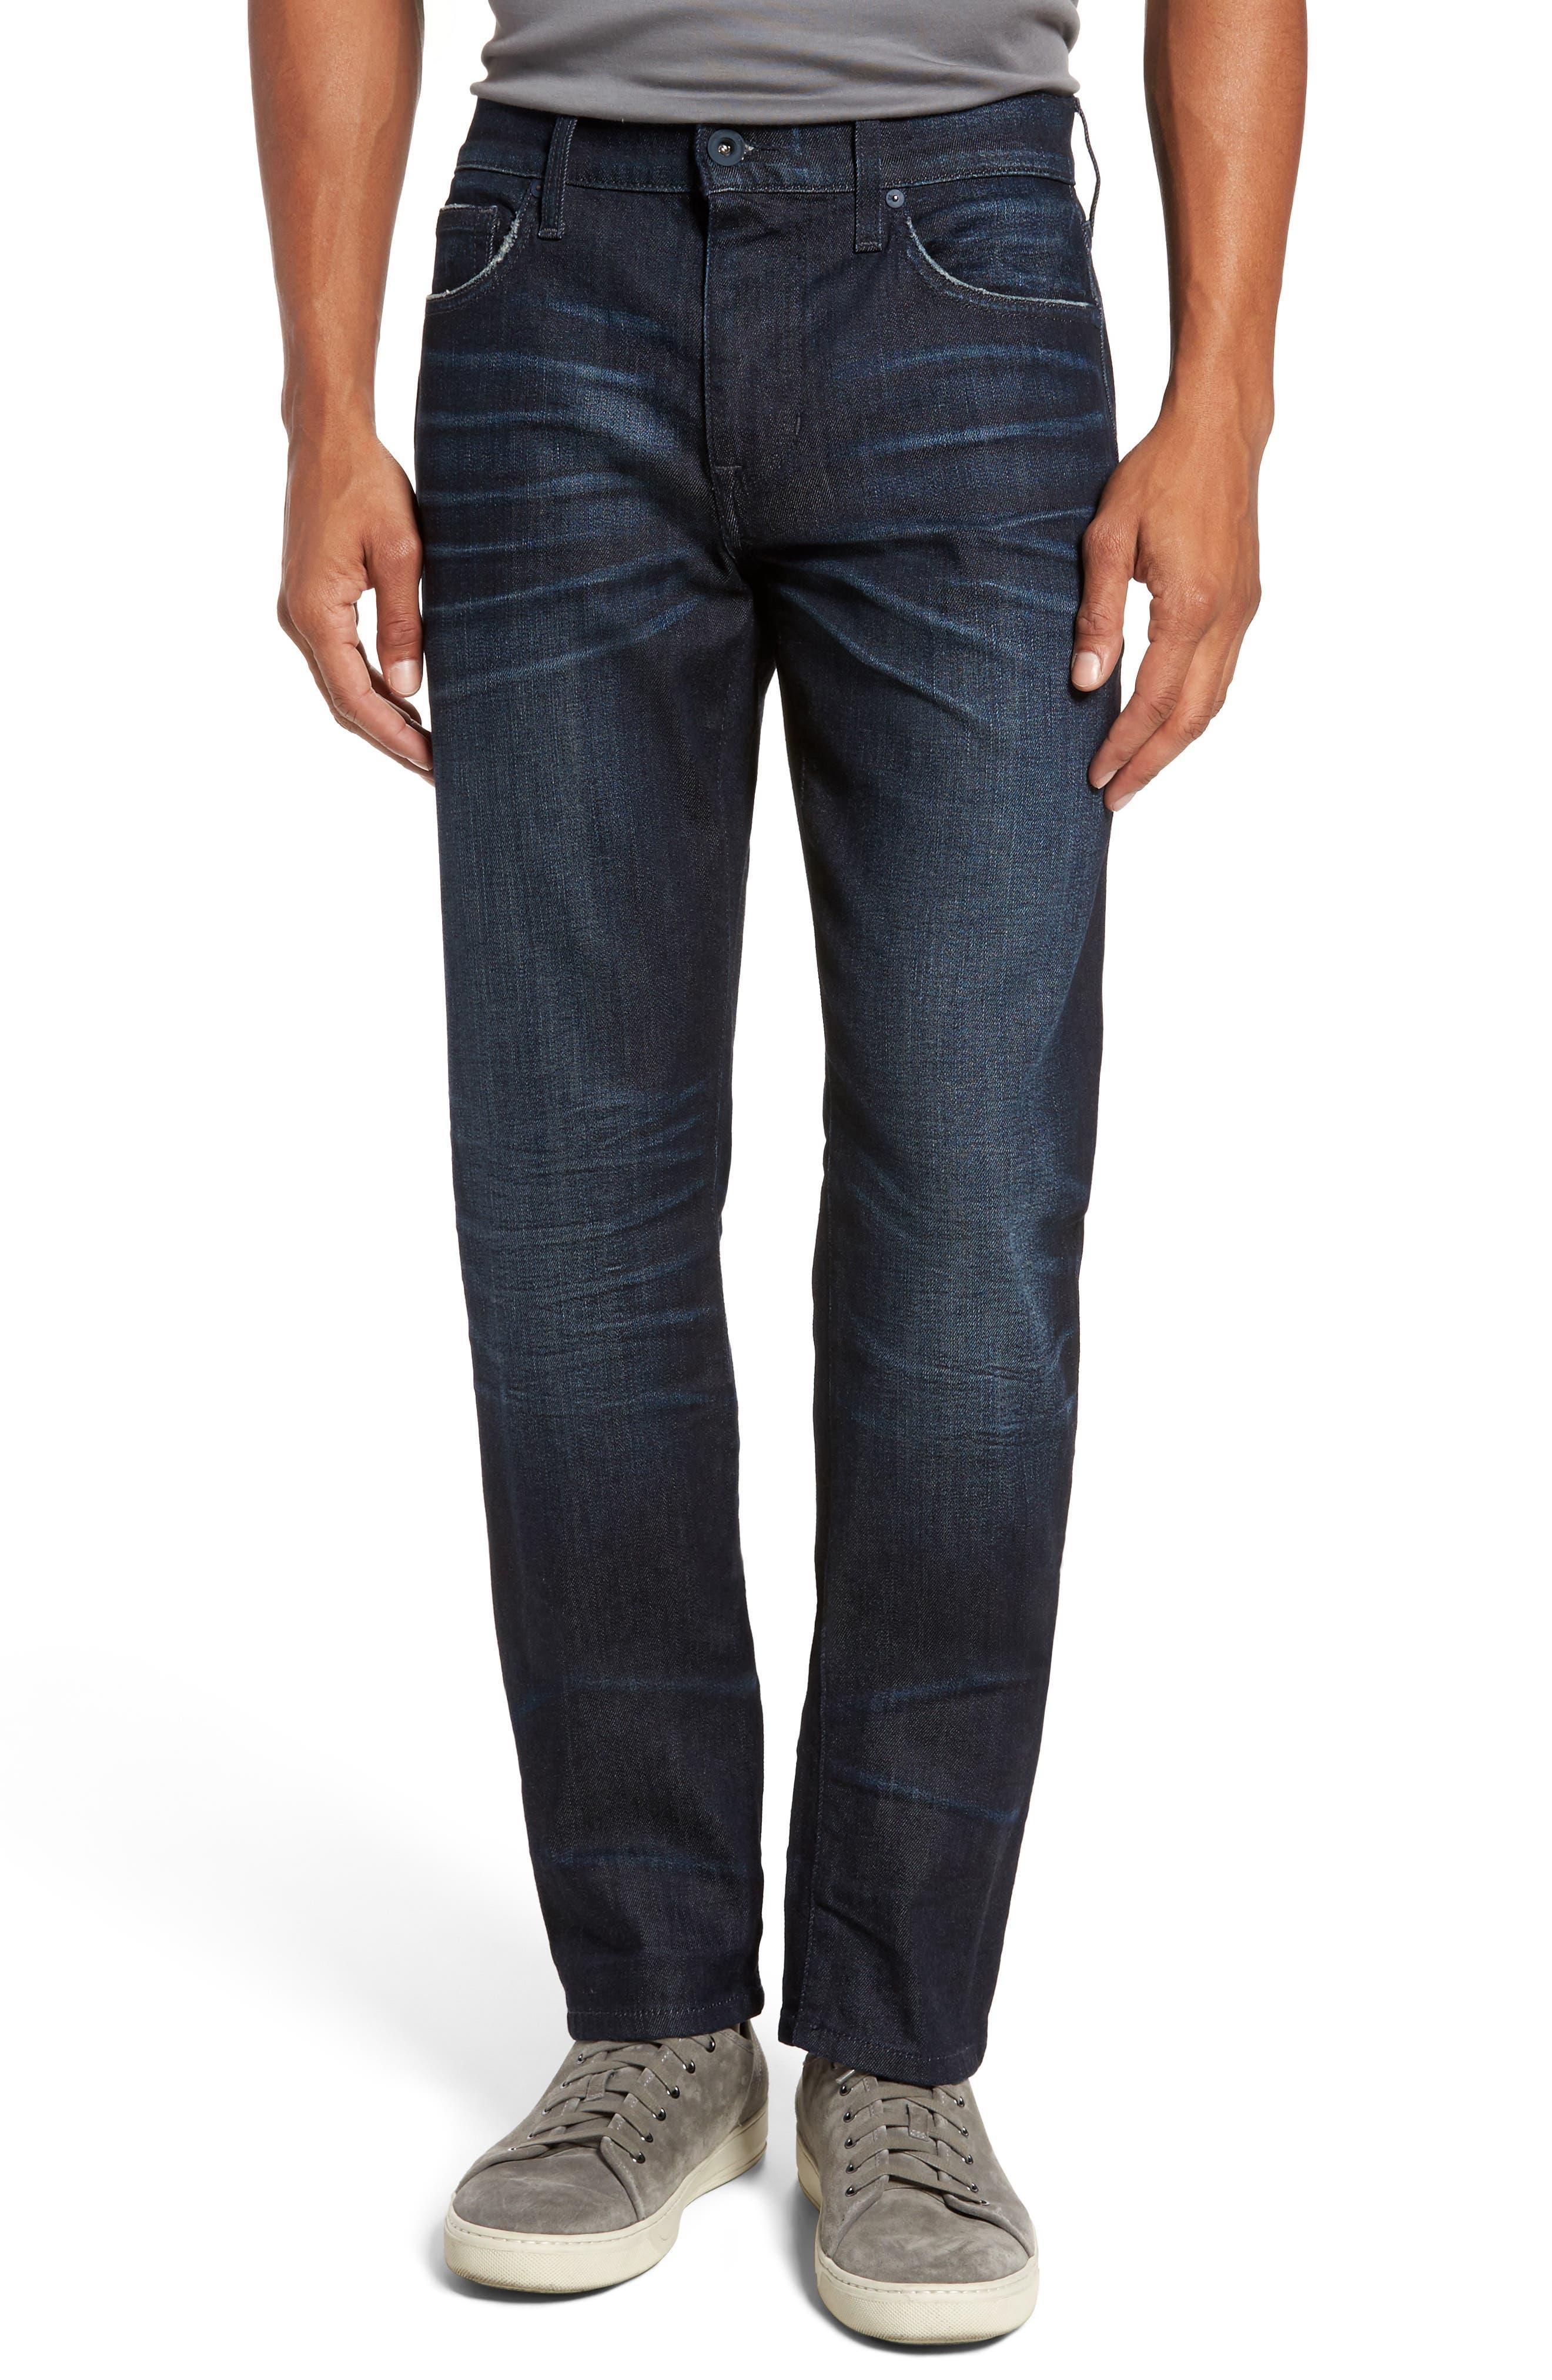 Brixton Slim Straight Fit Jeans,                             Main thumbnail 1, color,                             405